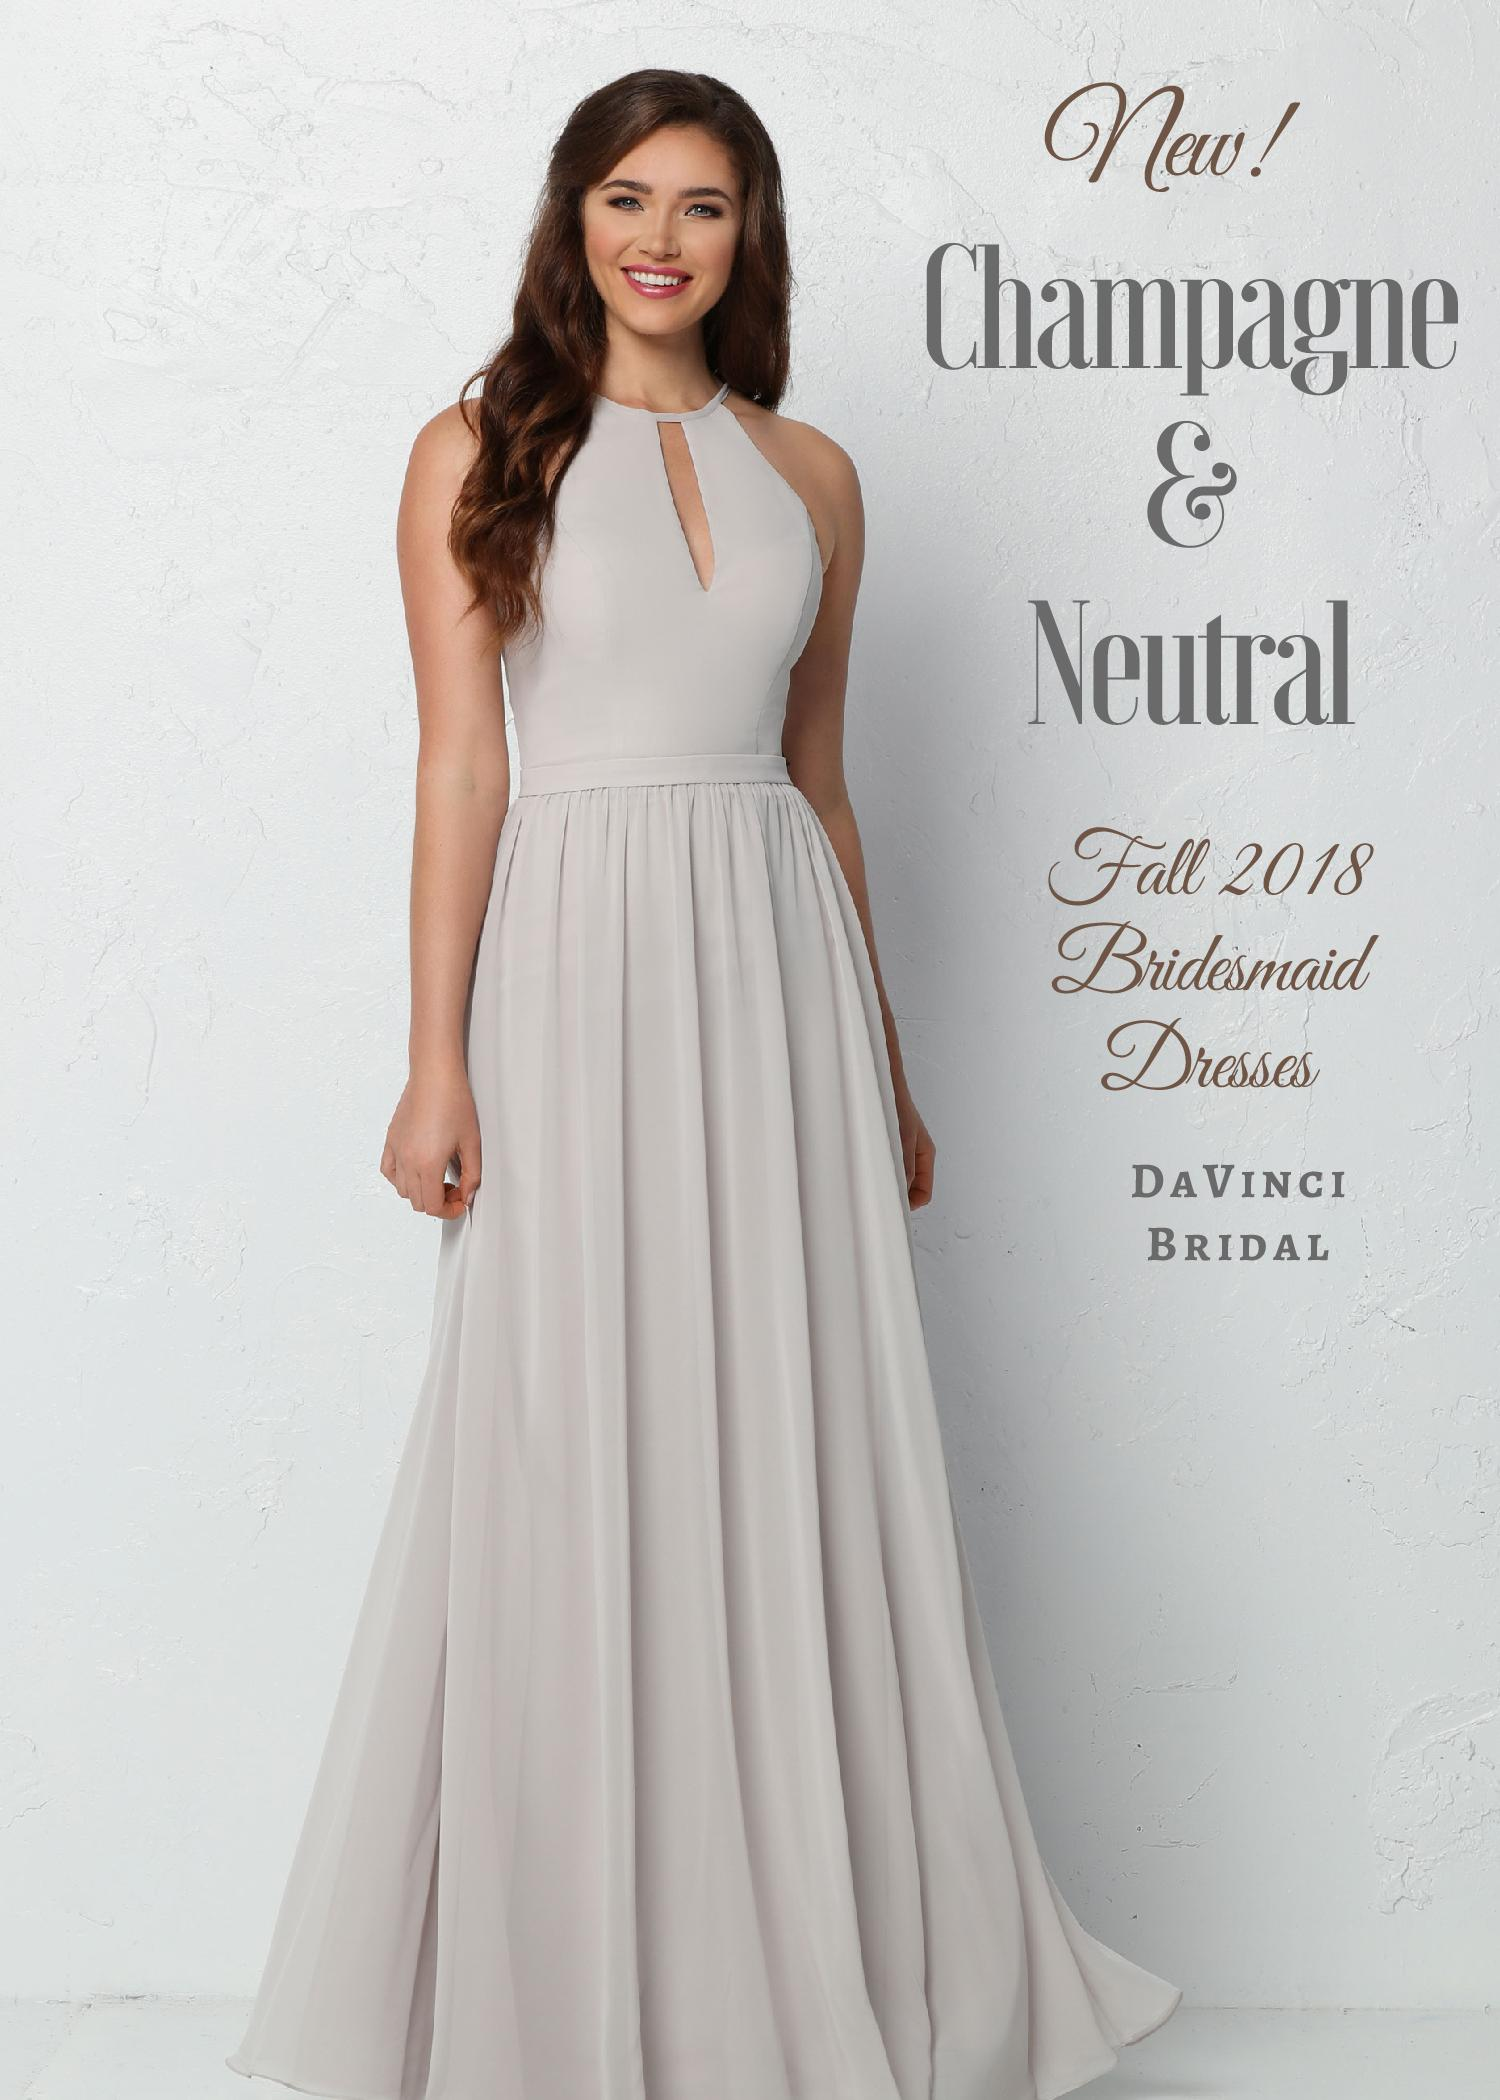 Long Champagne Color Bridesmaid Dress